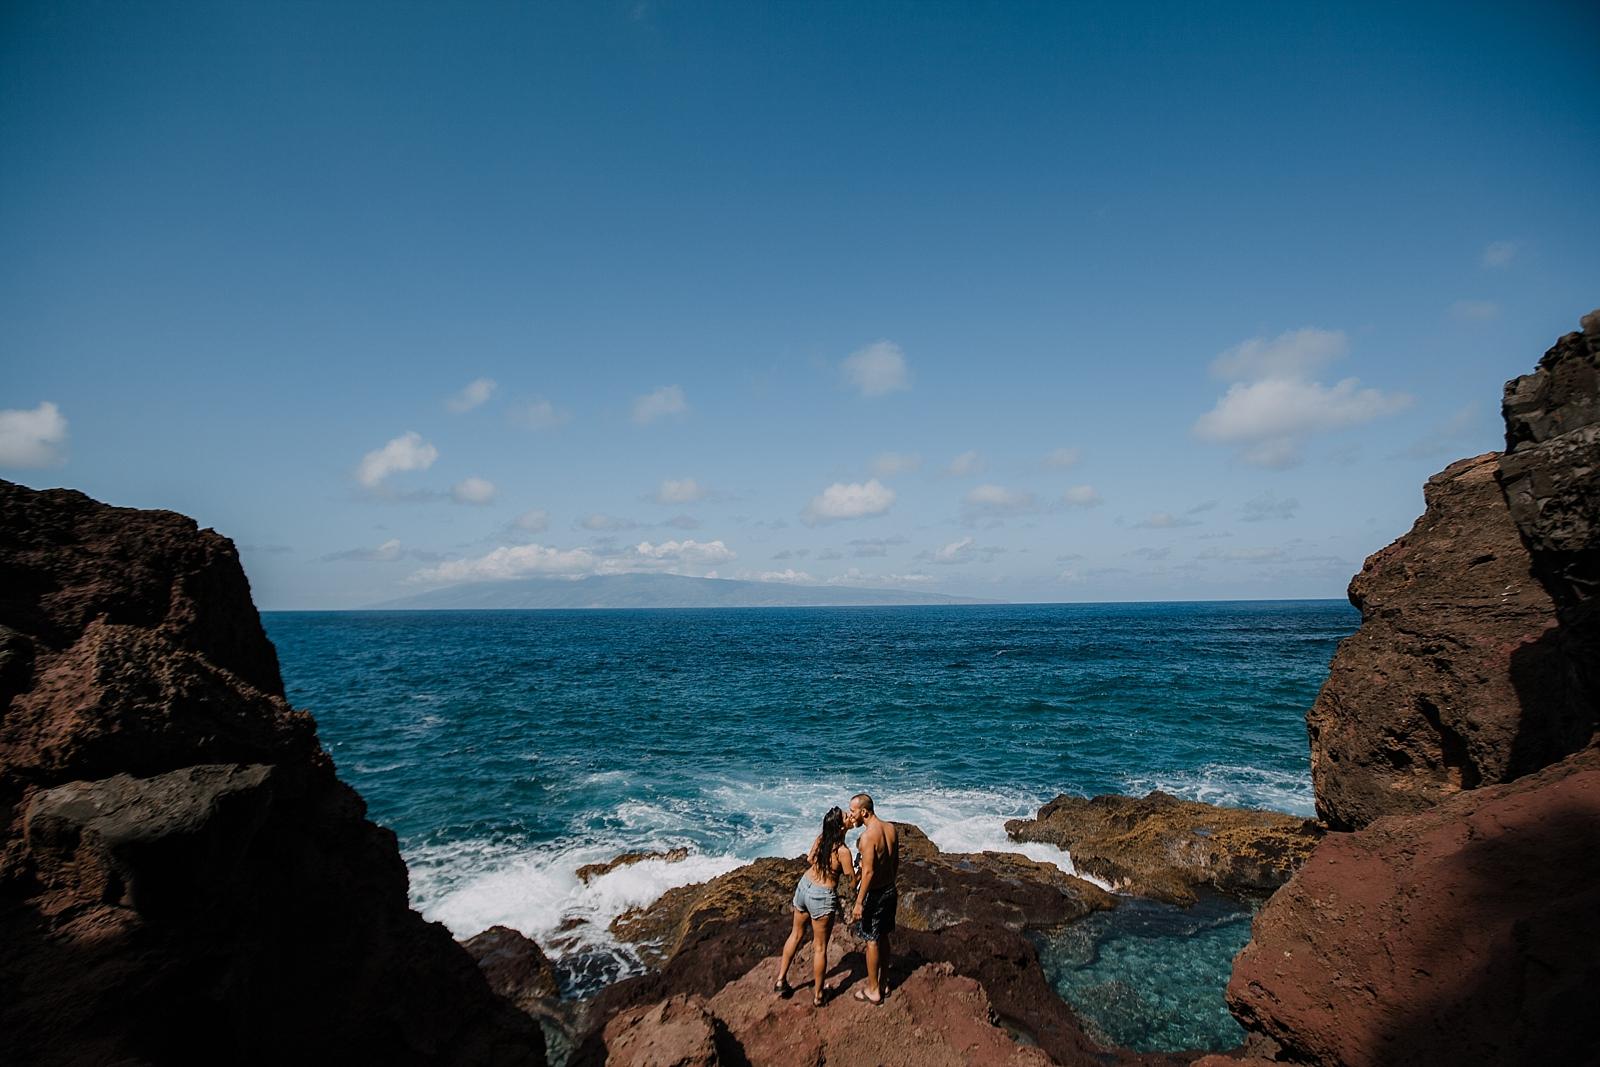 adventurous couple, lahaina wedding photographer, maui wedding photographer, adventurous wedding photographer, hawaiian wedding photographer, tide pools